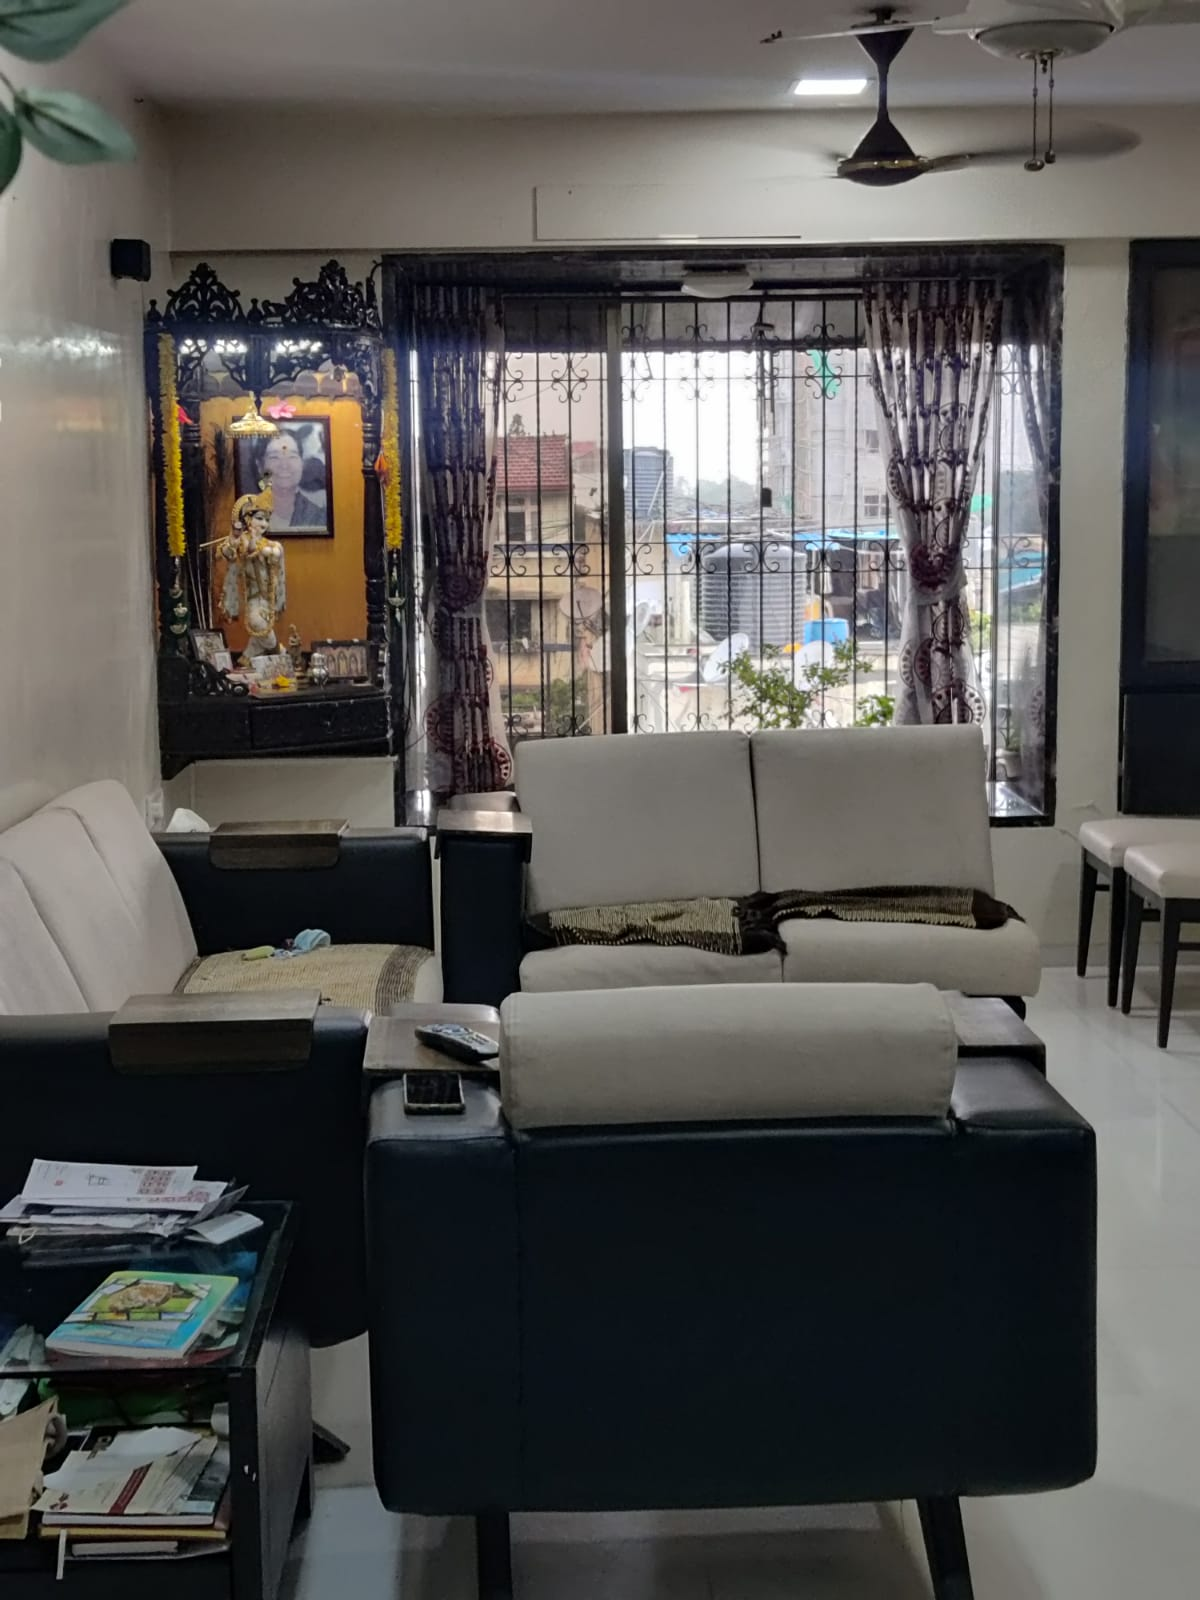 3 Bhk for Sale in Dadar West @5.1 Cr